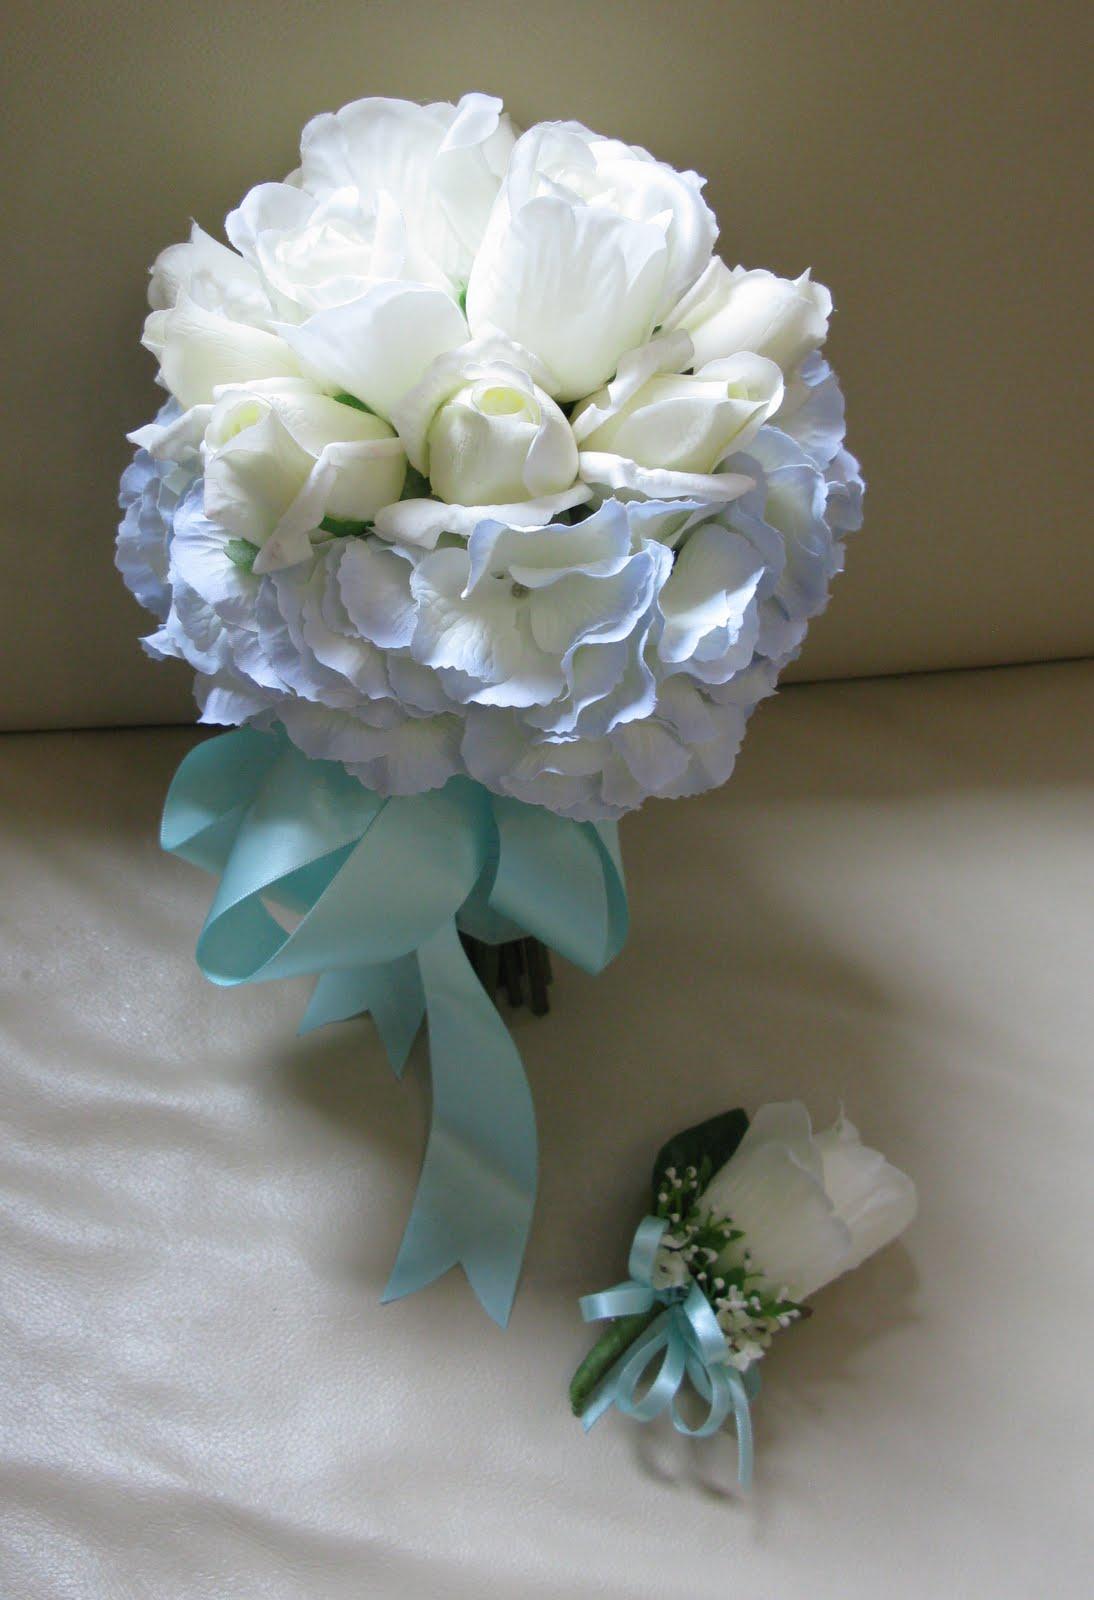 20 best Weddings at Citronelle Community Center images on ... |Light Blue Hydrangea Bouquet